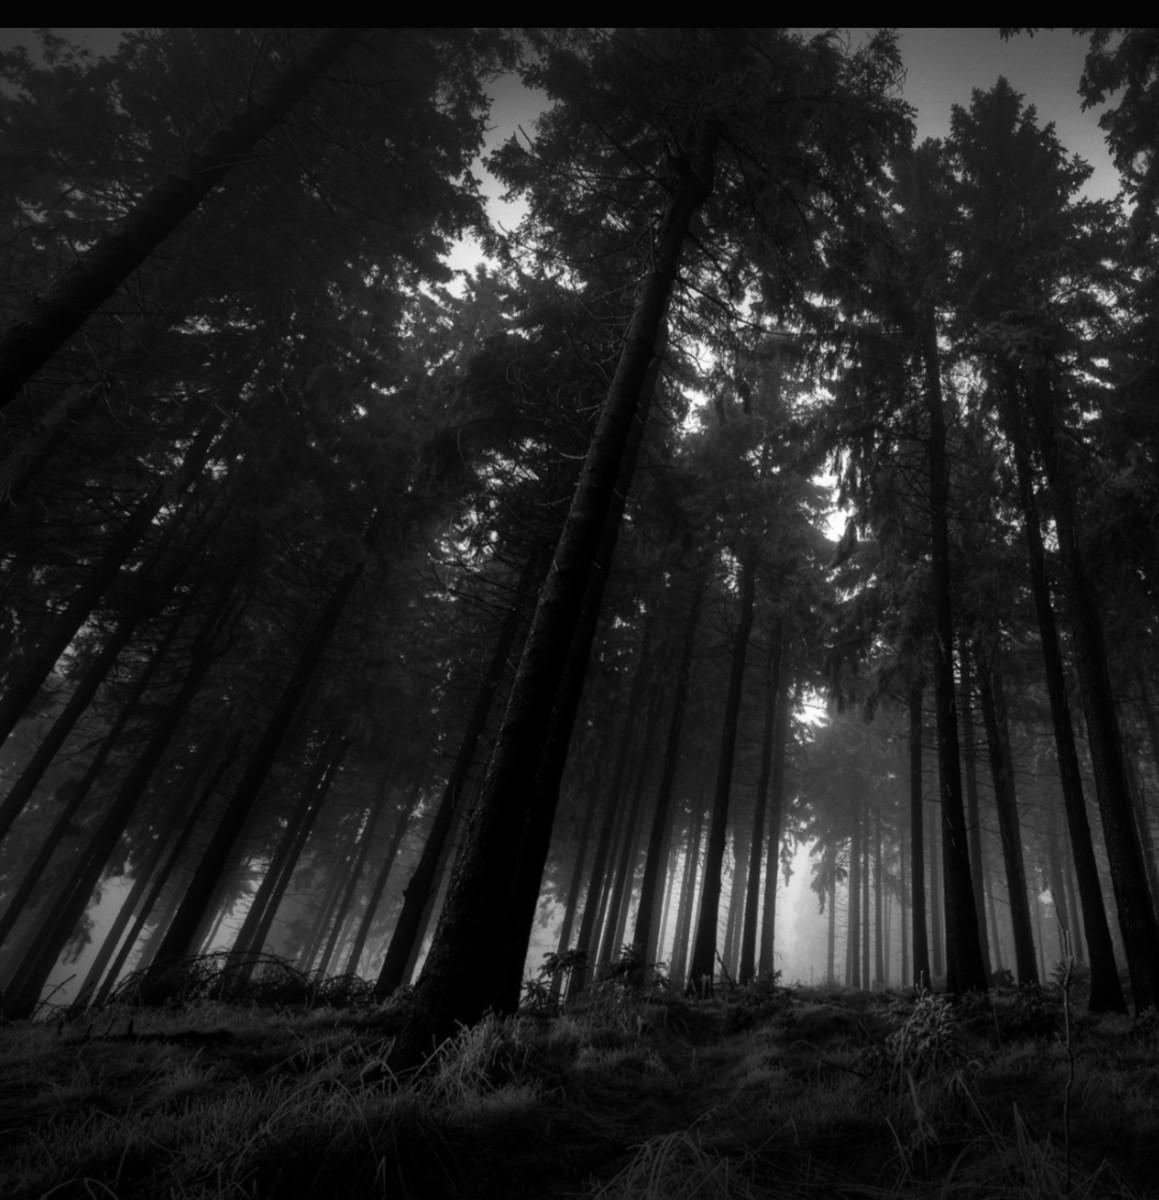 The Dark Woods Letterpile